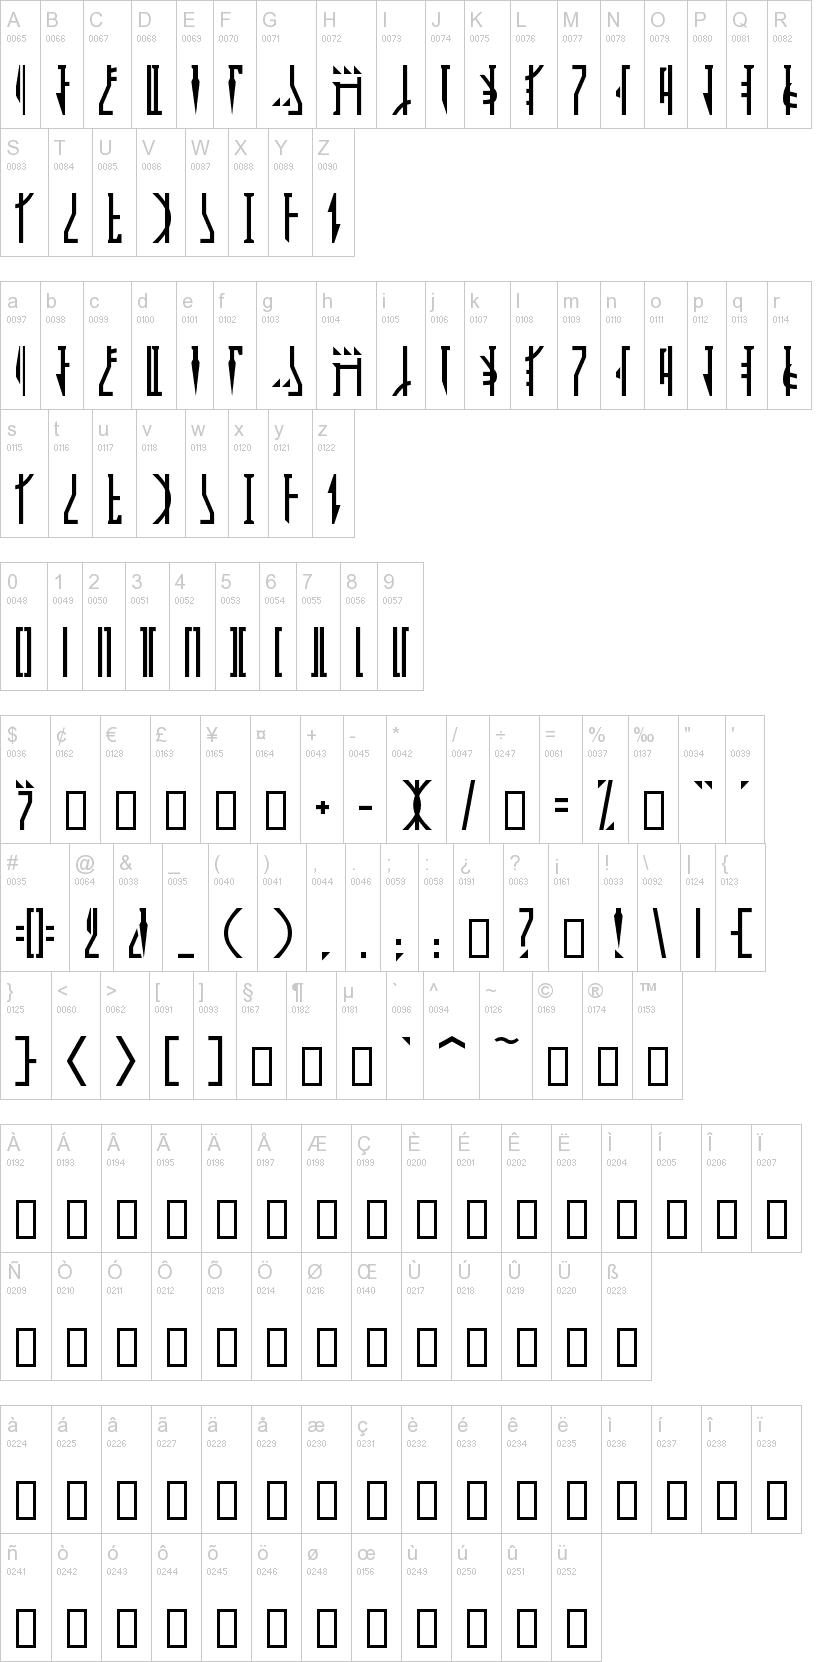 Mandalorian Font Dafont Com In 2020 Mandalorian Sketch Book Mandalore